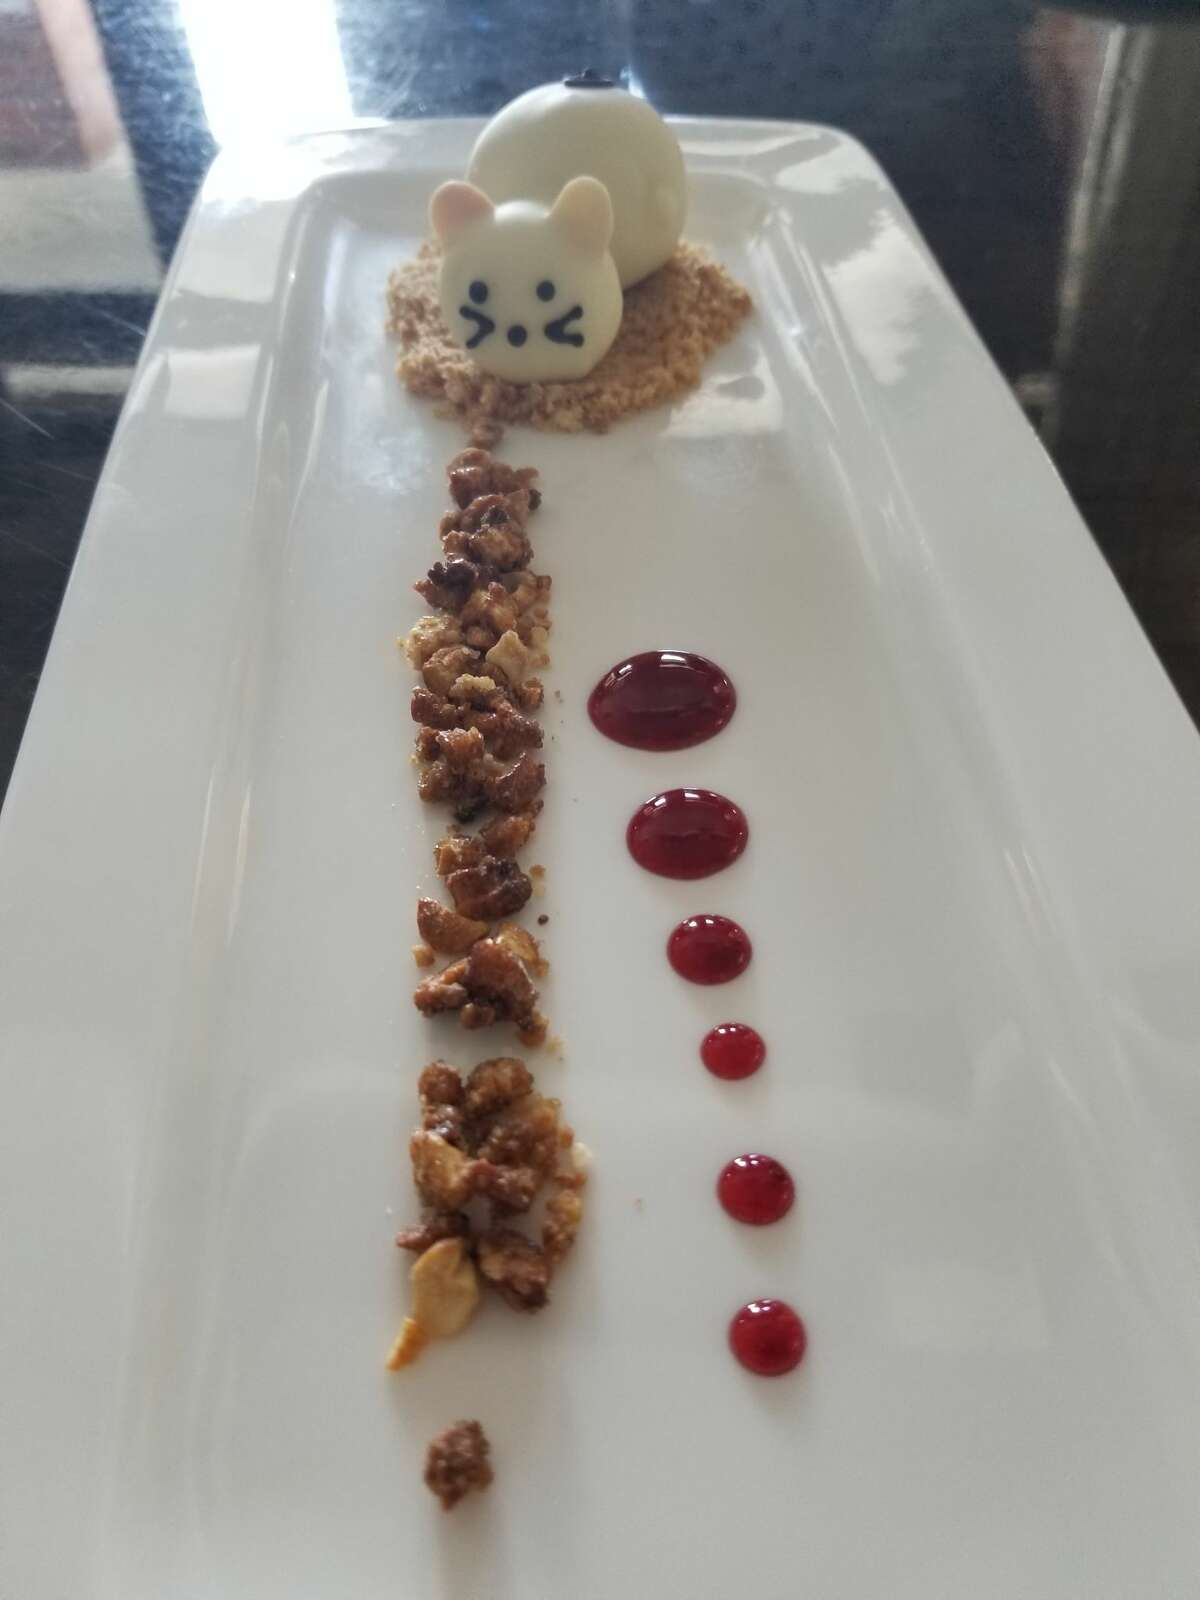 Latin Bites chef demo - to buy your Culinary Stars tickets go to www.houstonculinarystars.com!